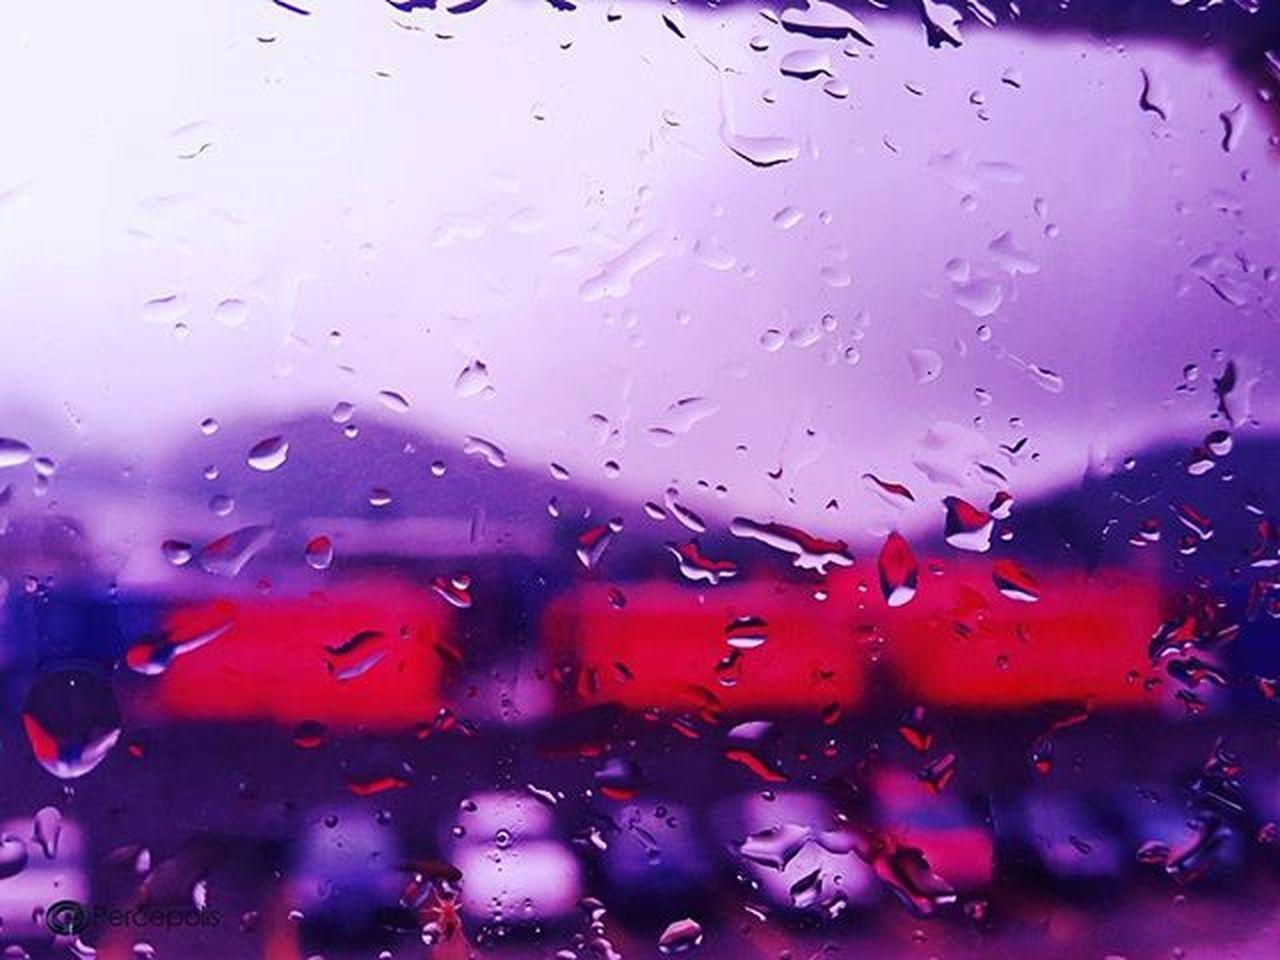 Llueve sobre San Pedro Sula. 07.12.15 Fotografia Lluvia Sps Honduras Percepolis12 Nature Gallery_of_all Everycapture Everyshots Rainy Paiscincoestrellas InicioDeSemana Instapic Instadaily Samsung Macro Macrophotography